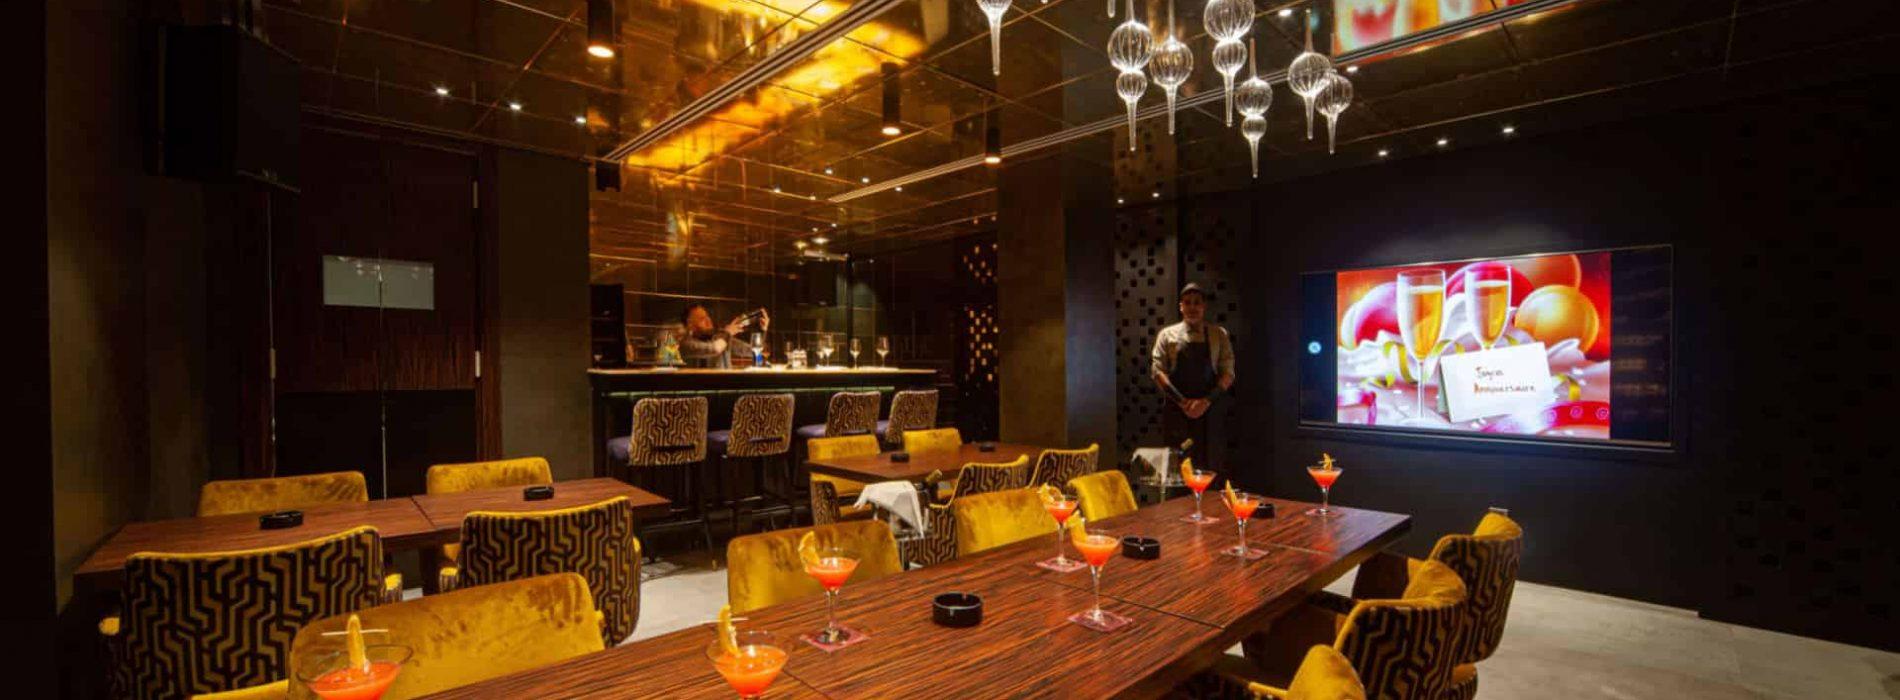 Urban Lounge & Restaurant - Rabat -featured